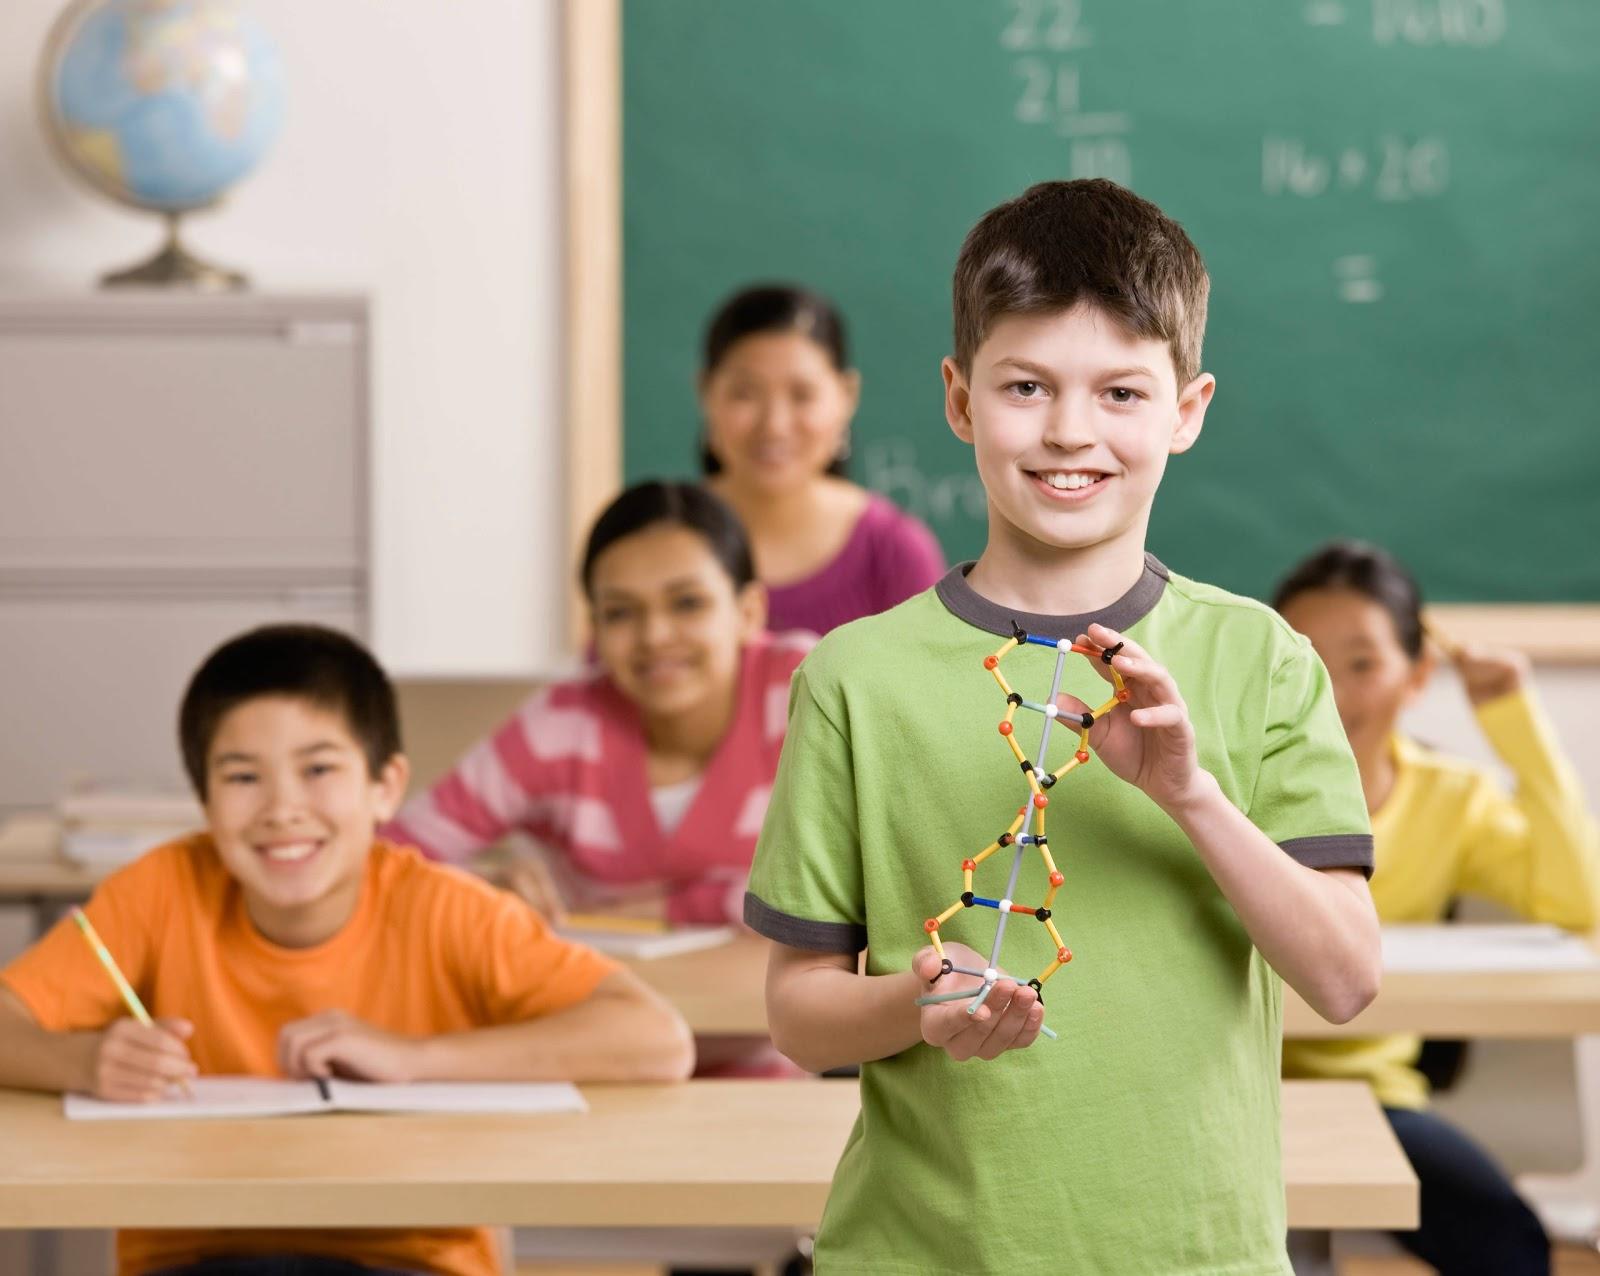 http://1.bp.blogspot.com/_E0lrTQ7bI1Q/TL2p_VwBMiI/AAAAAAAADCw/XbqtYlDGJt4/s1600/cute+smiling+kids+in+class+room+wallpapers.jpeg